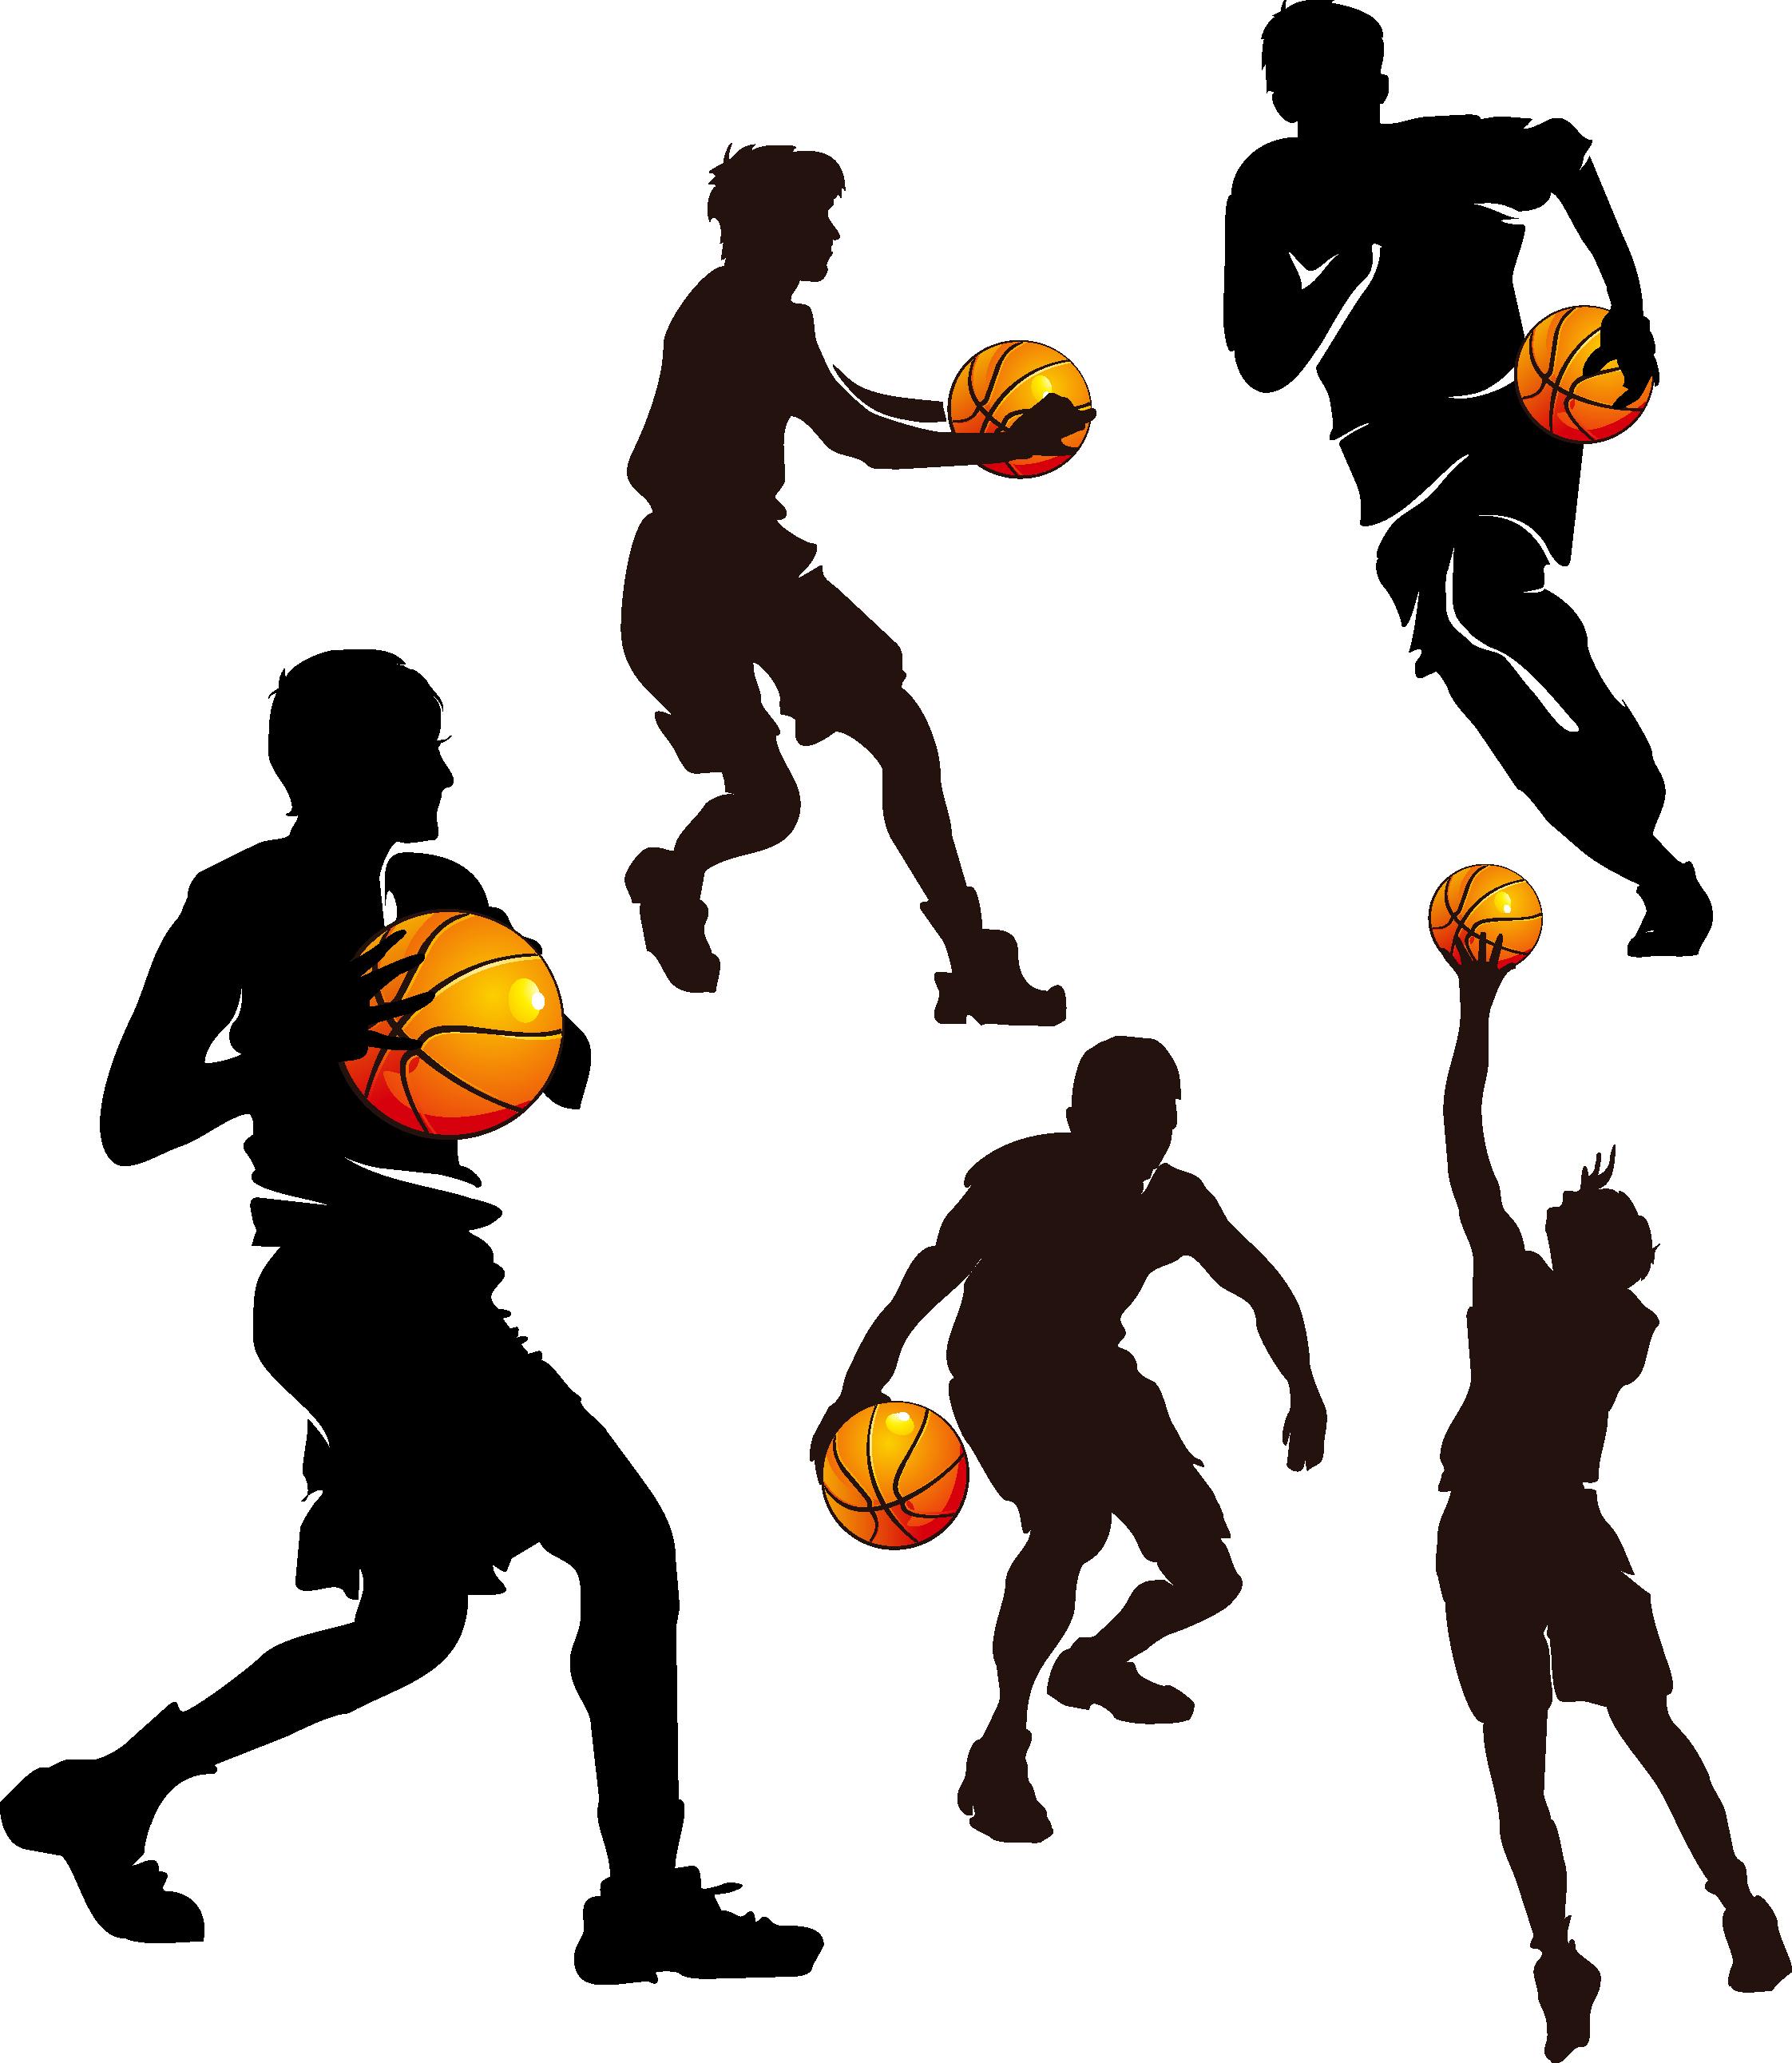 Silhouette team at getdrawings. Teamwork clipart basketball